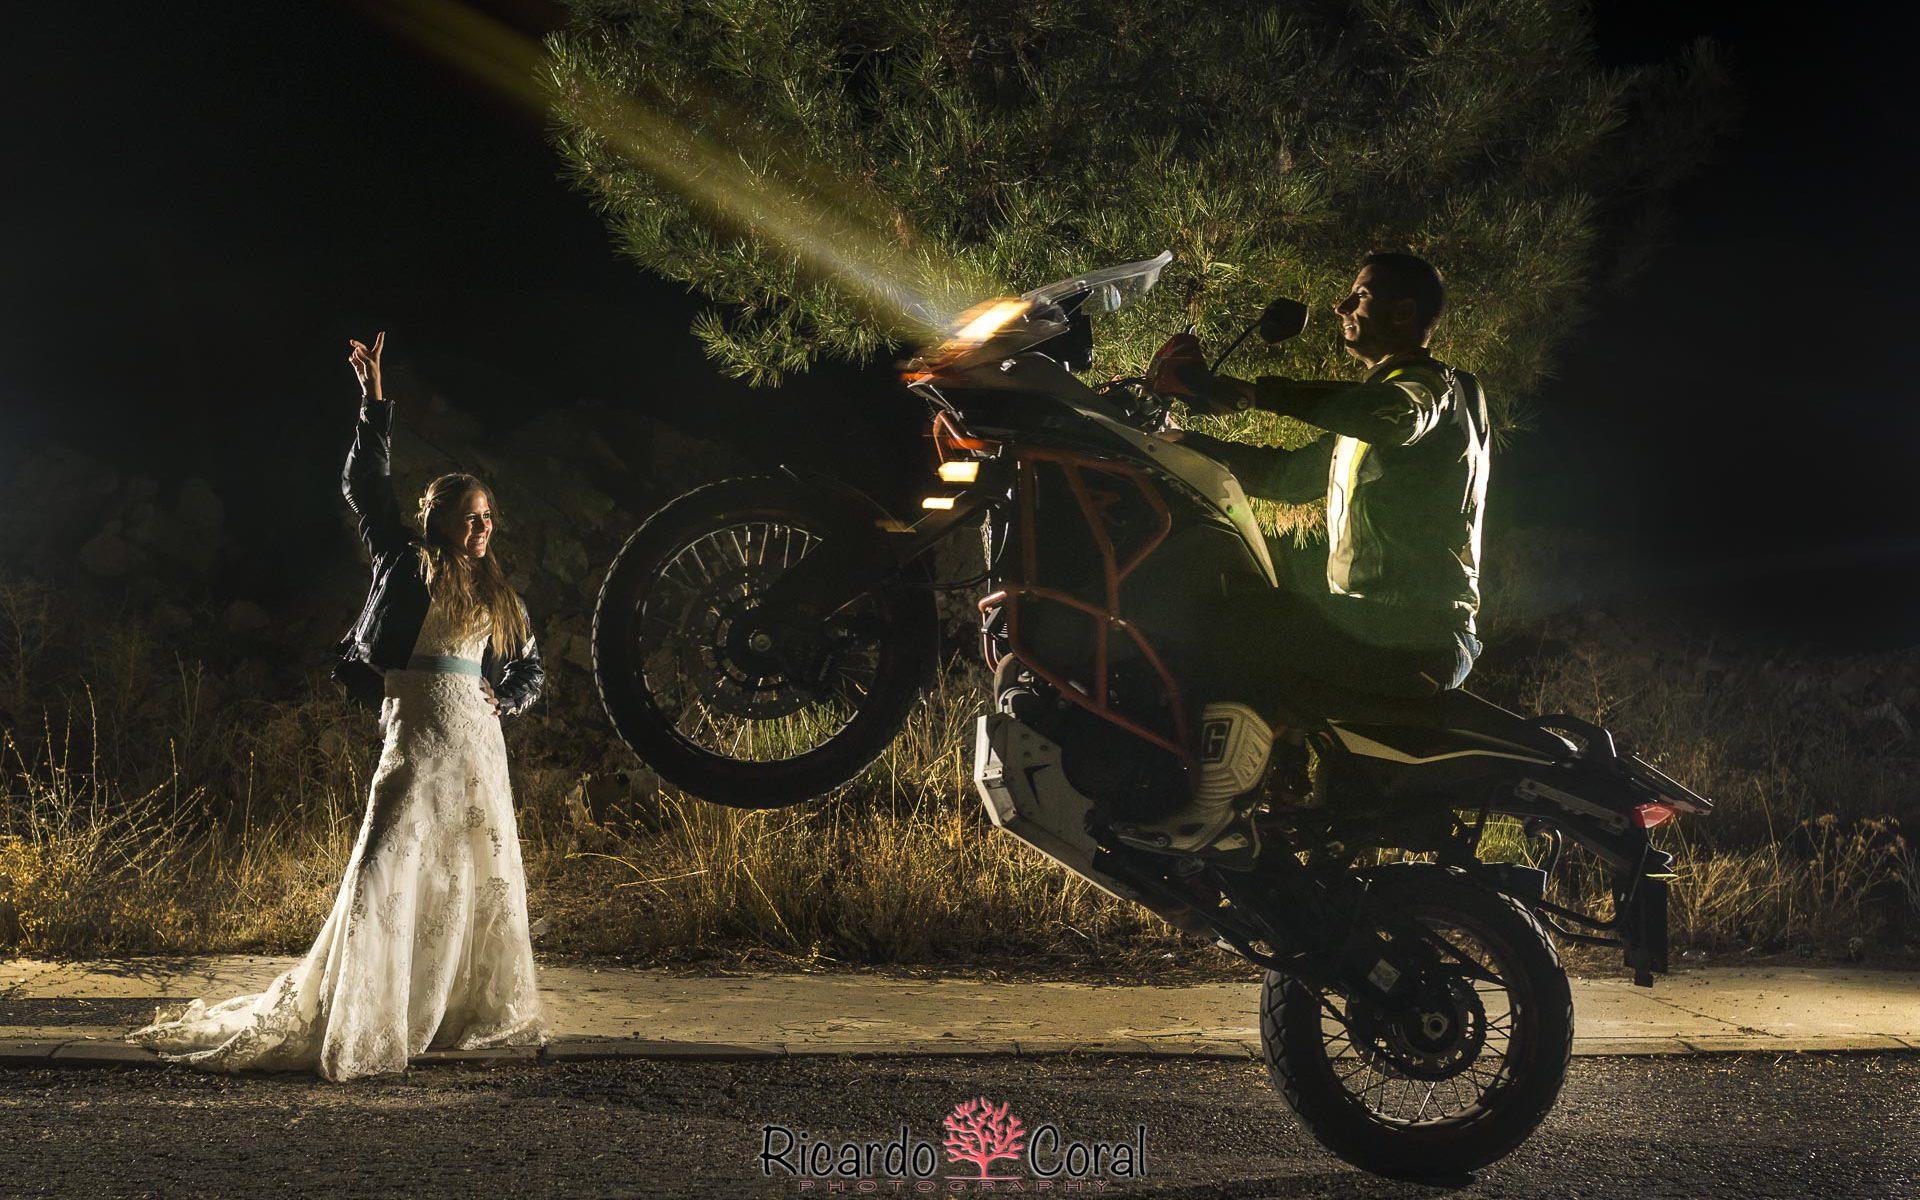 Fotografia de boda motera y espectacular